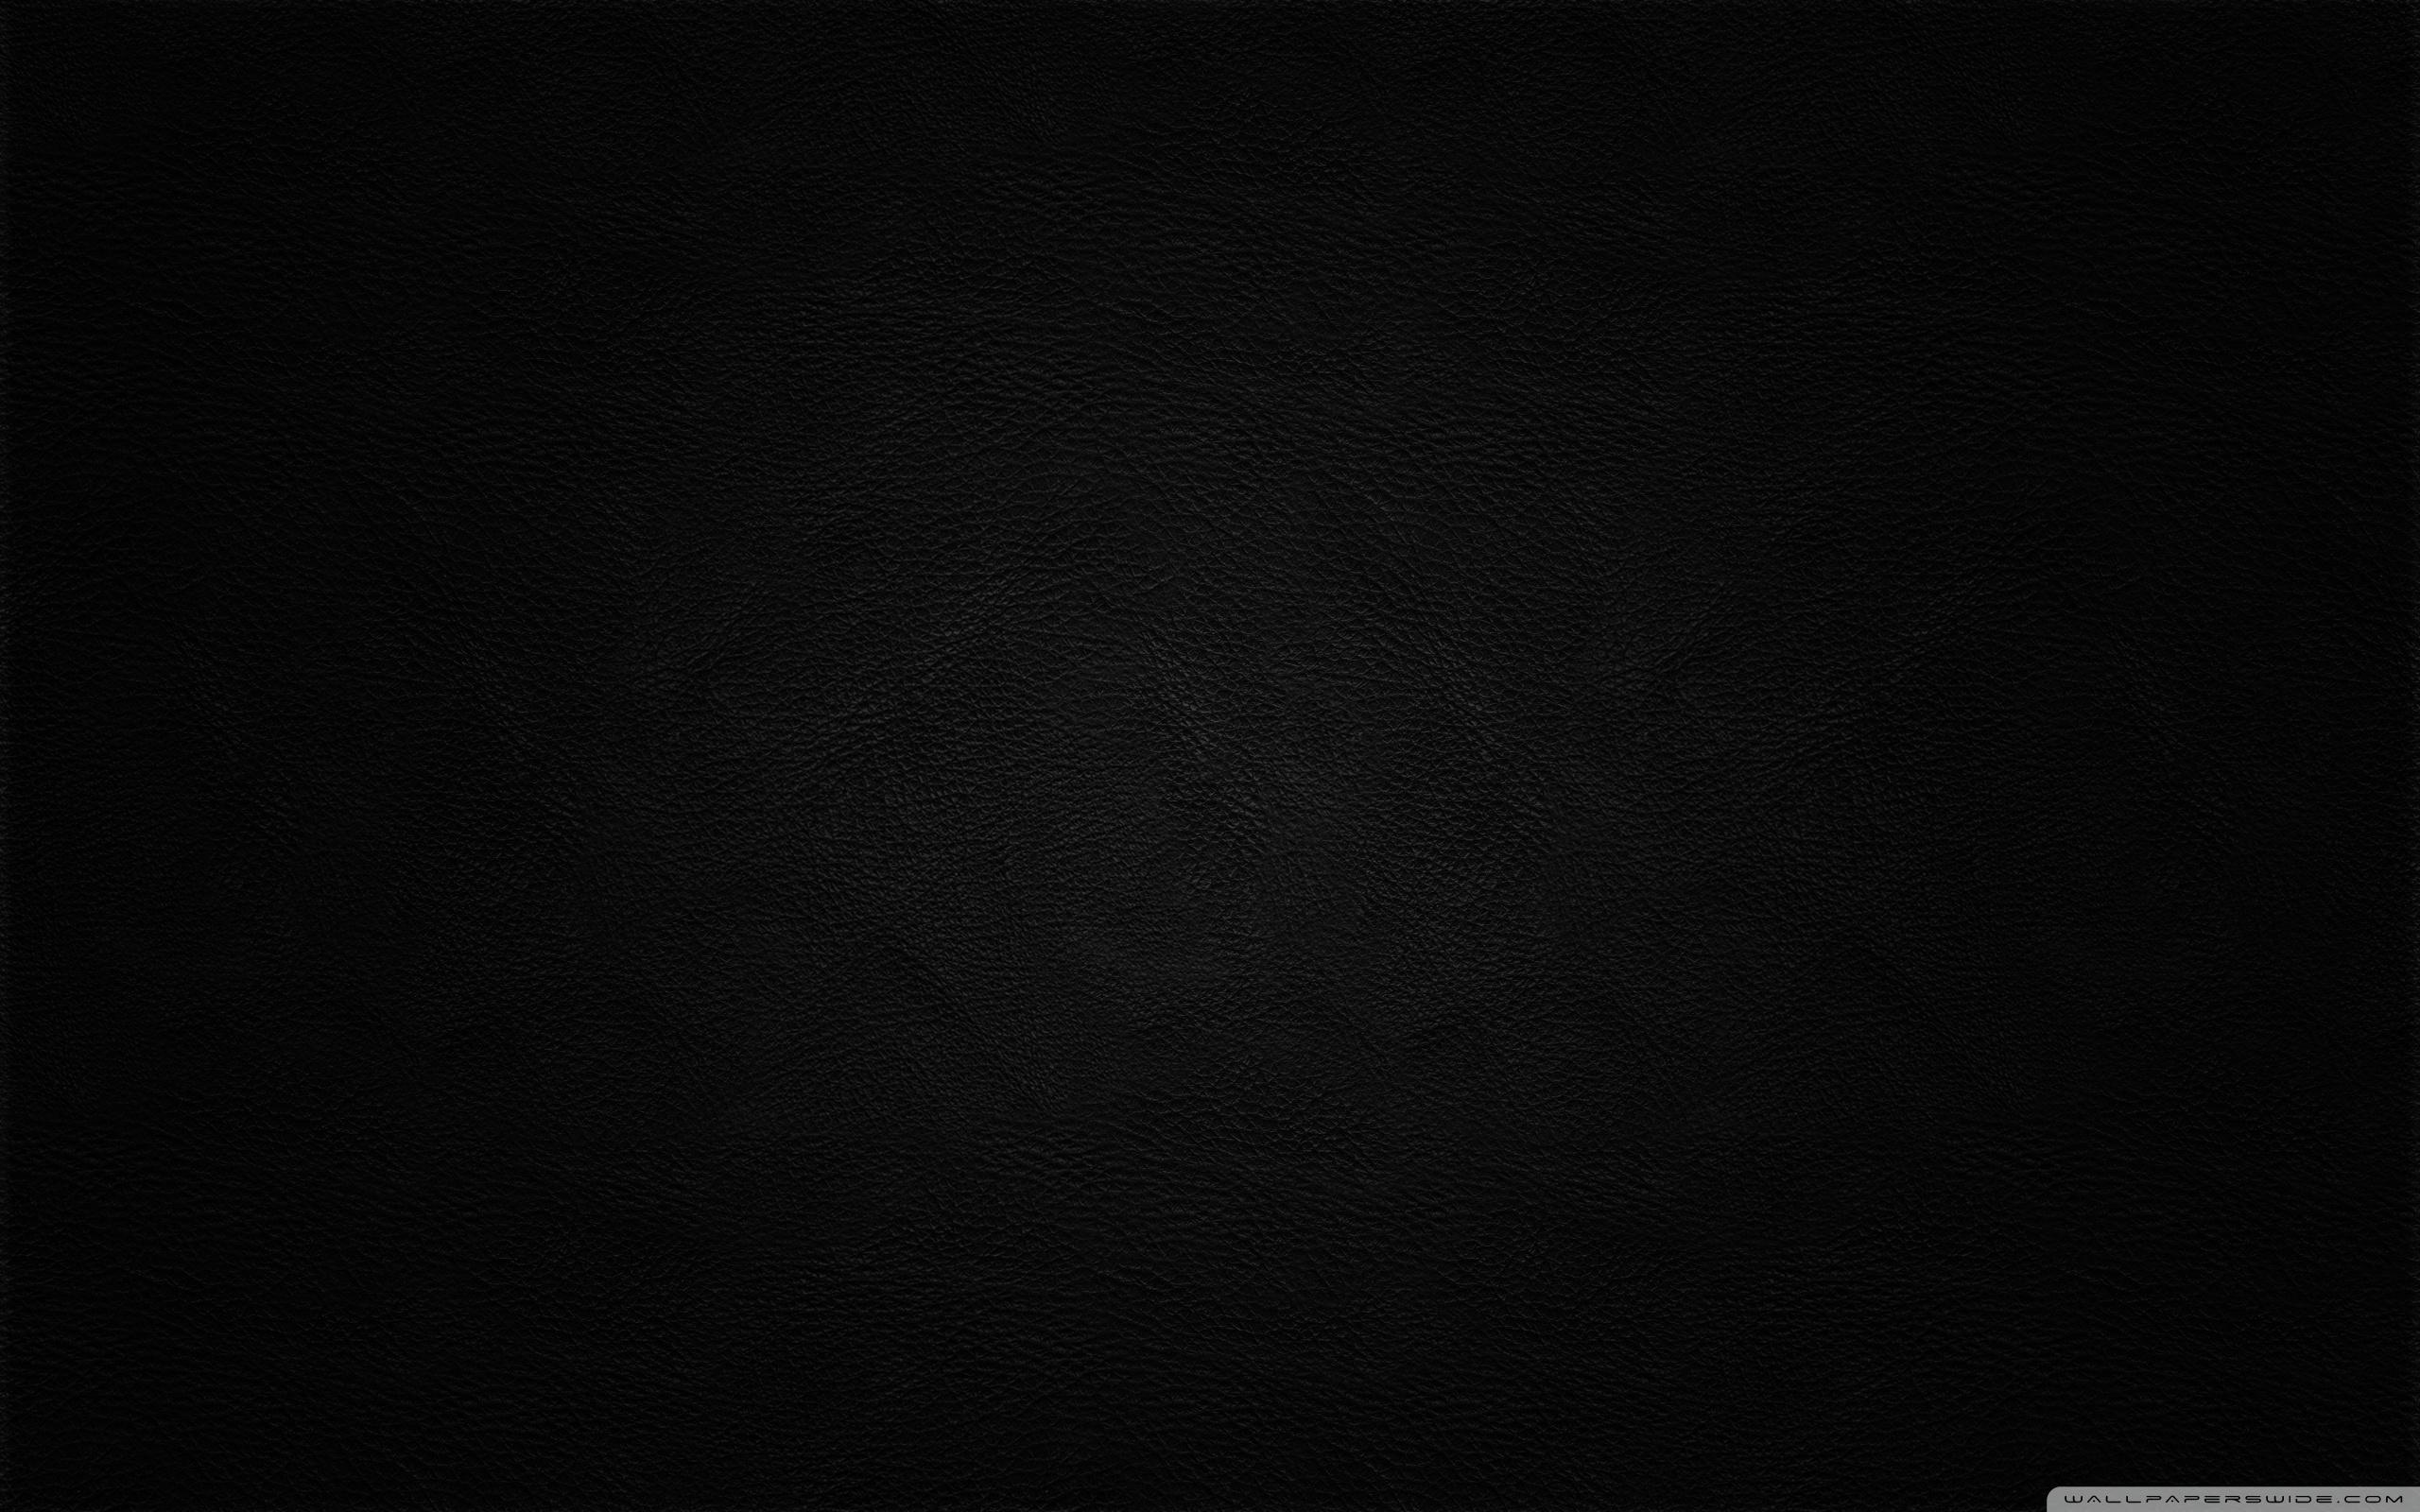 black-background 6ba6fa4b2eb